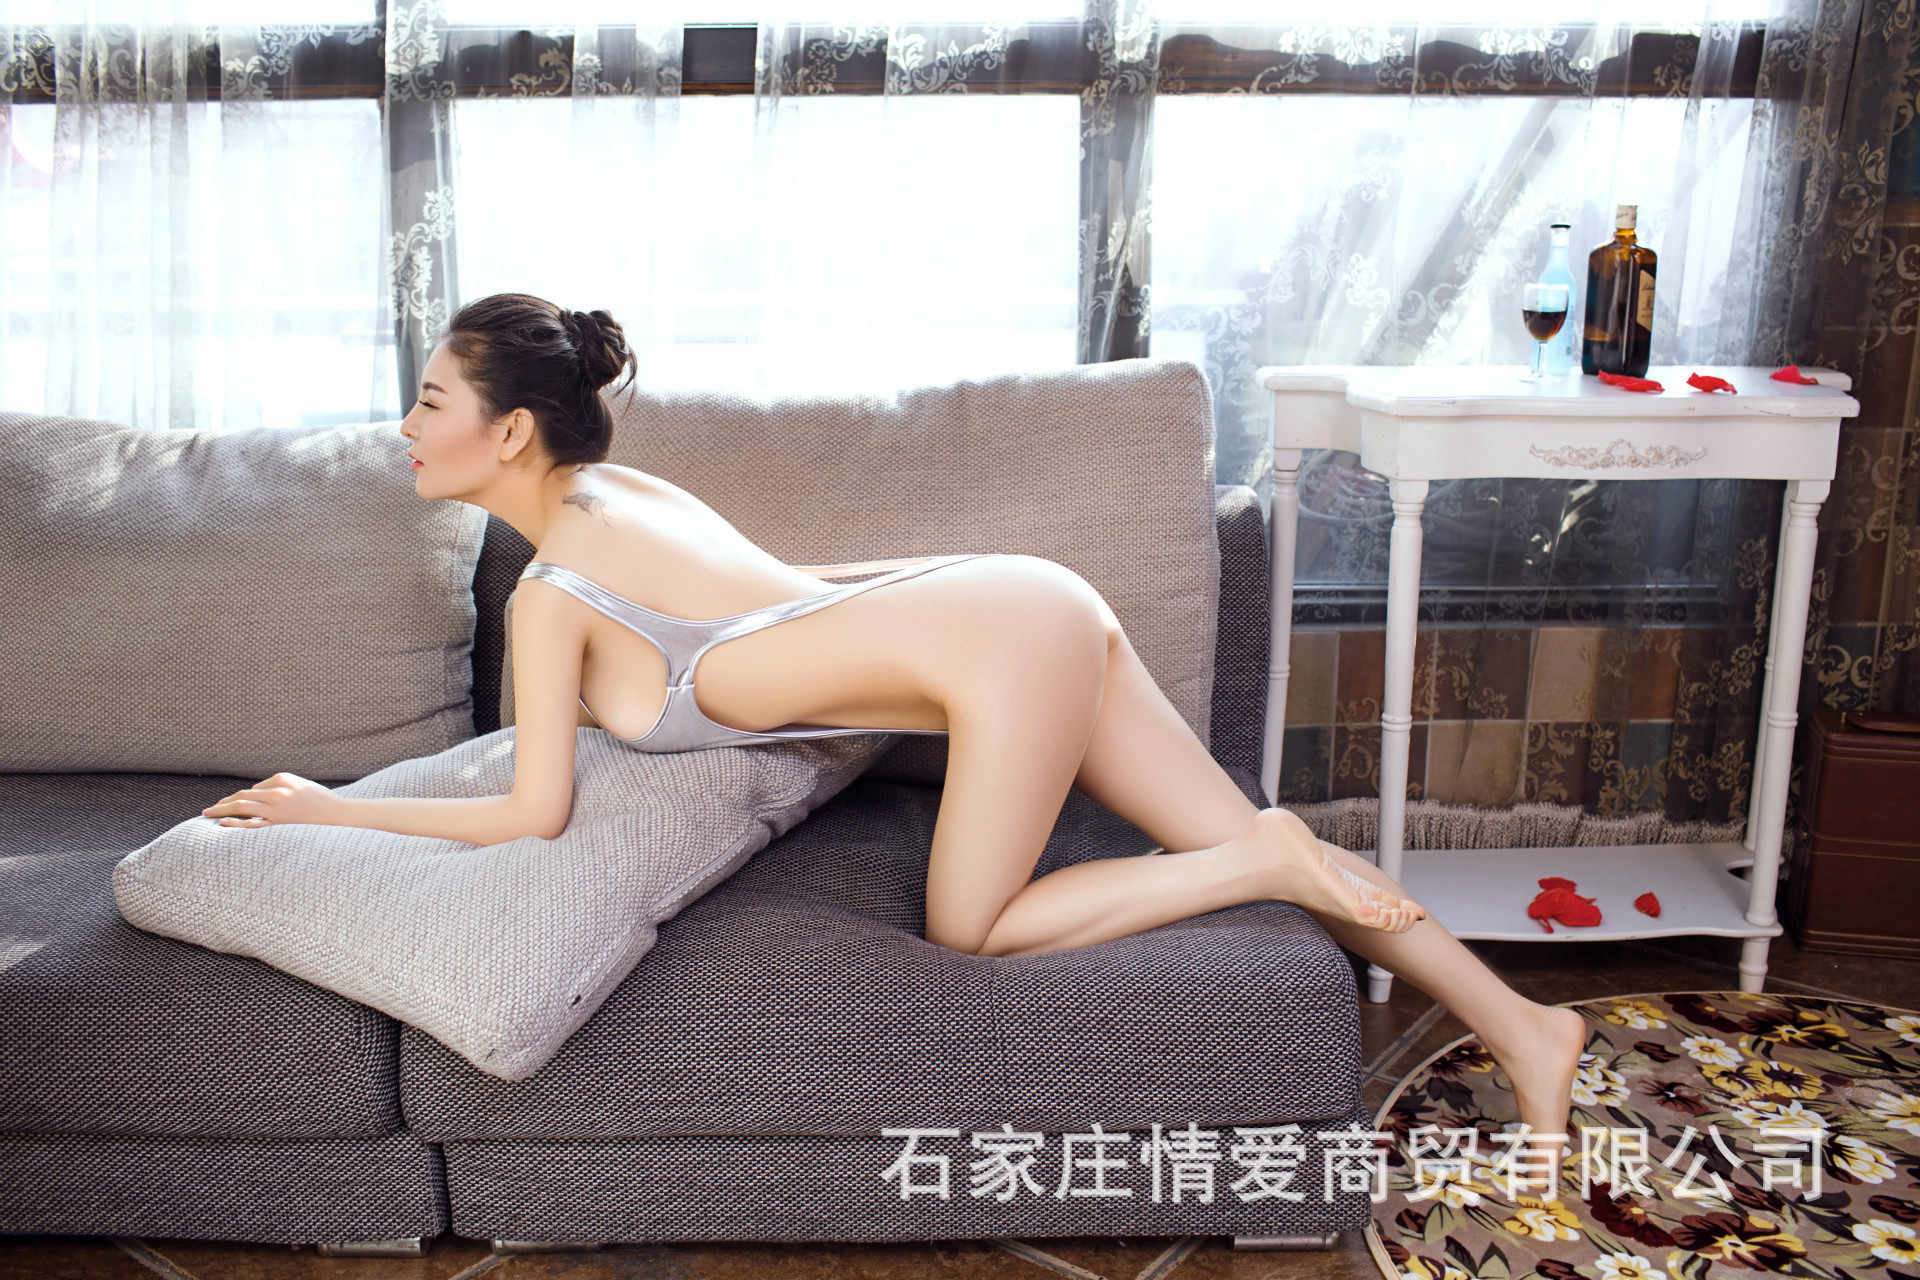 Neue Sexy Frauen Ein Stück PU Leder Body Latex Catsuit Erotische Trikot Kostüme Wetlook Sleeveless High Cut Body Bademode